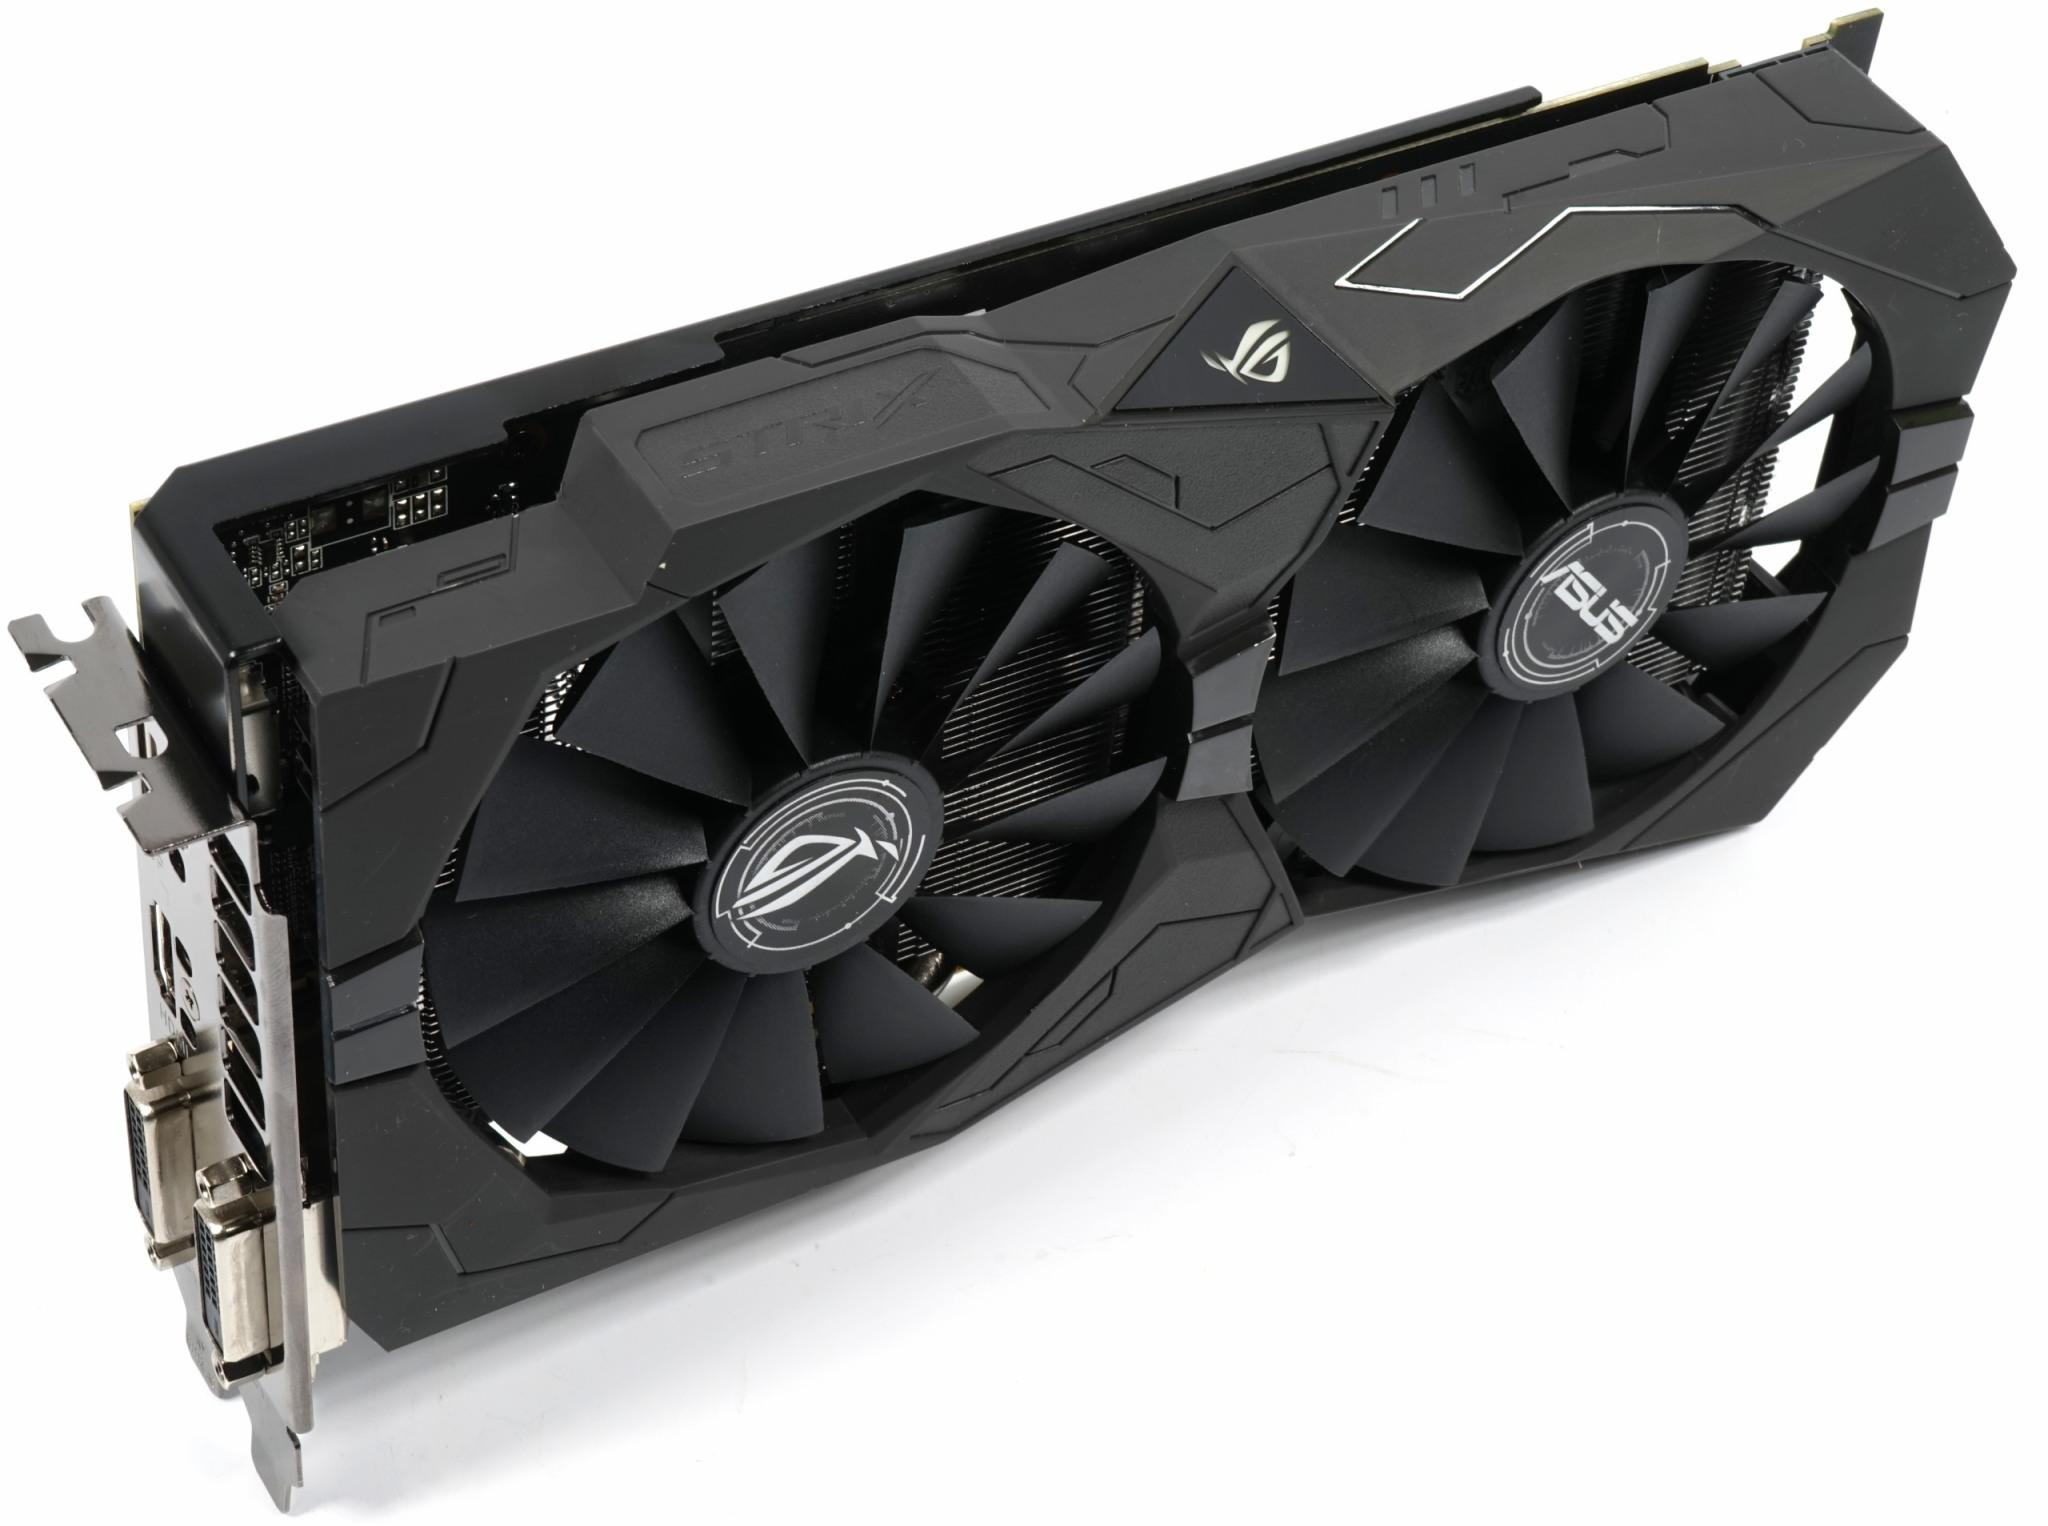 Asus ROG Strix Radeon RX 570 4GB